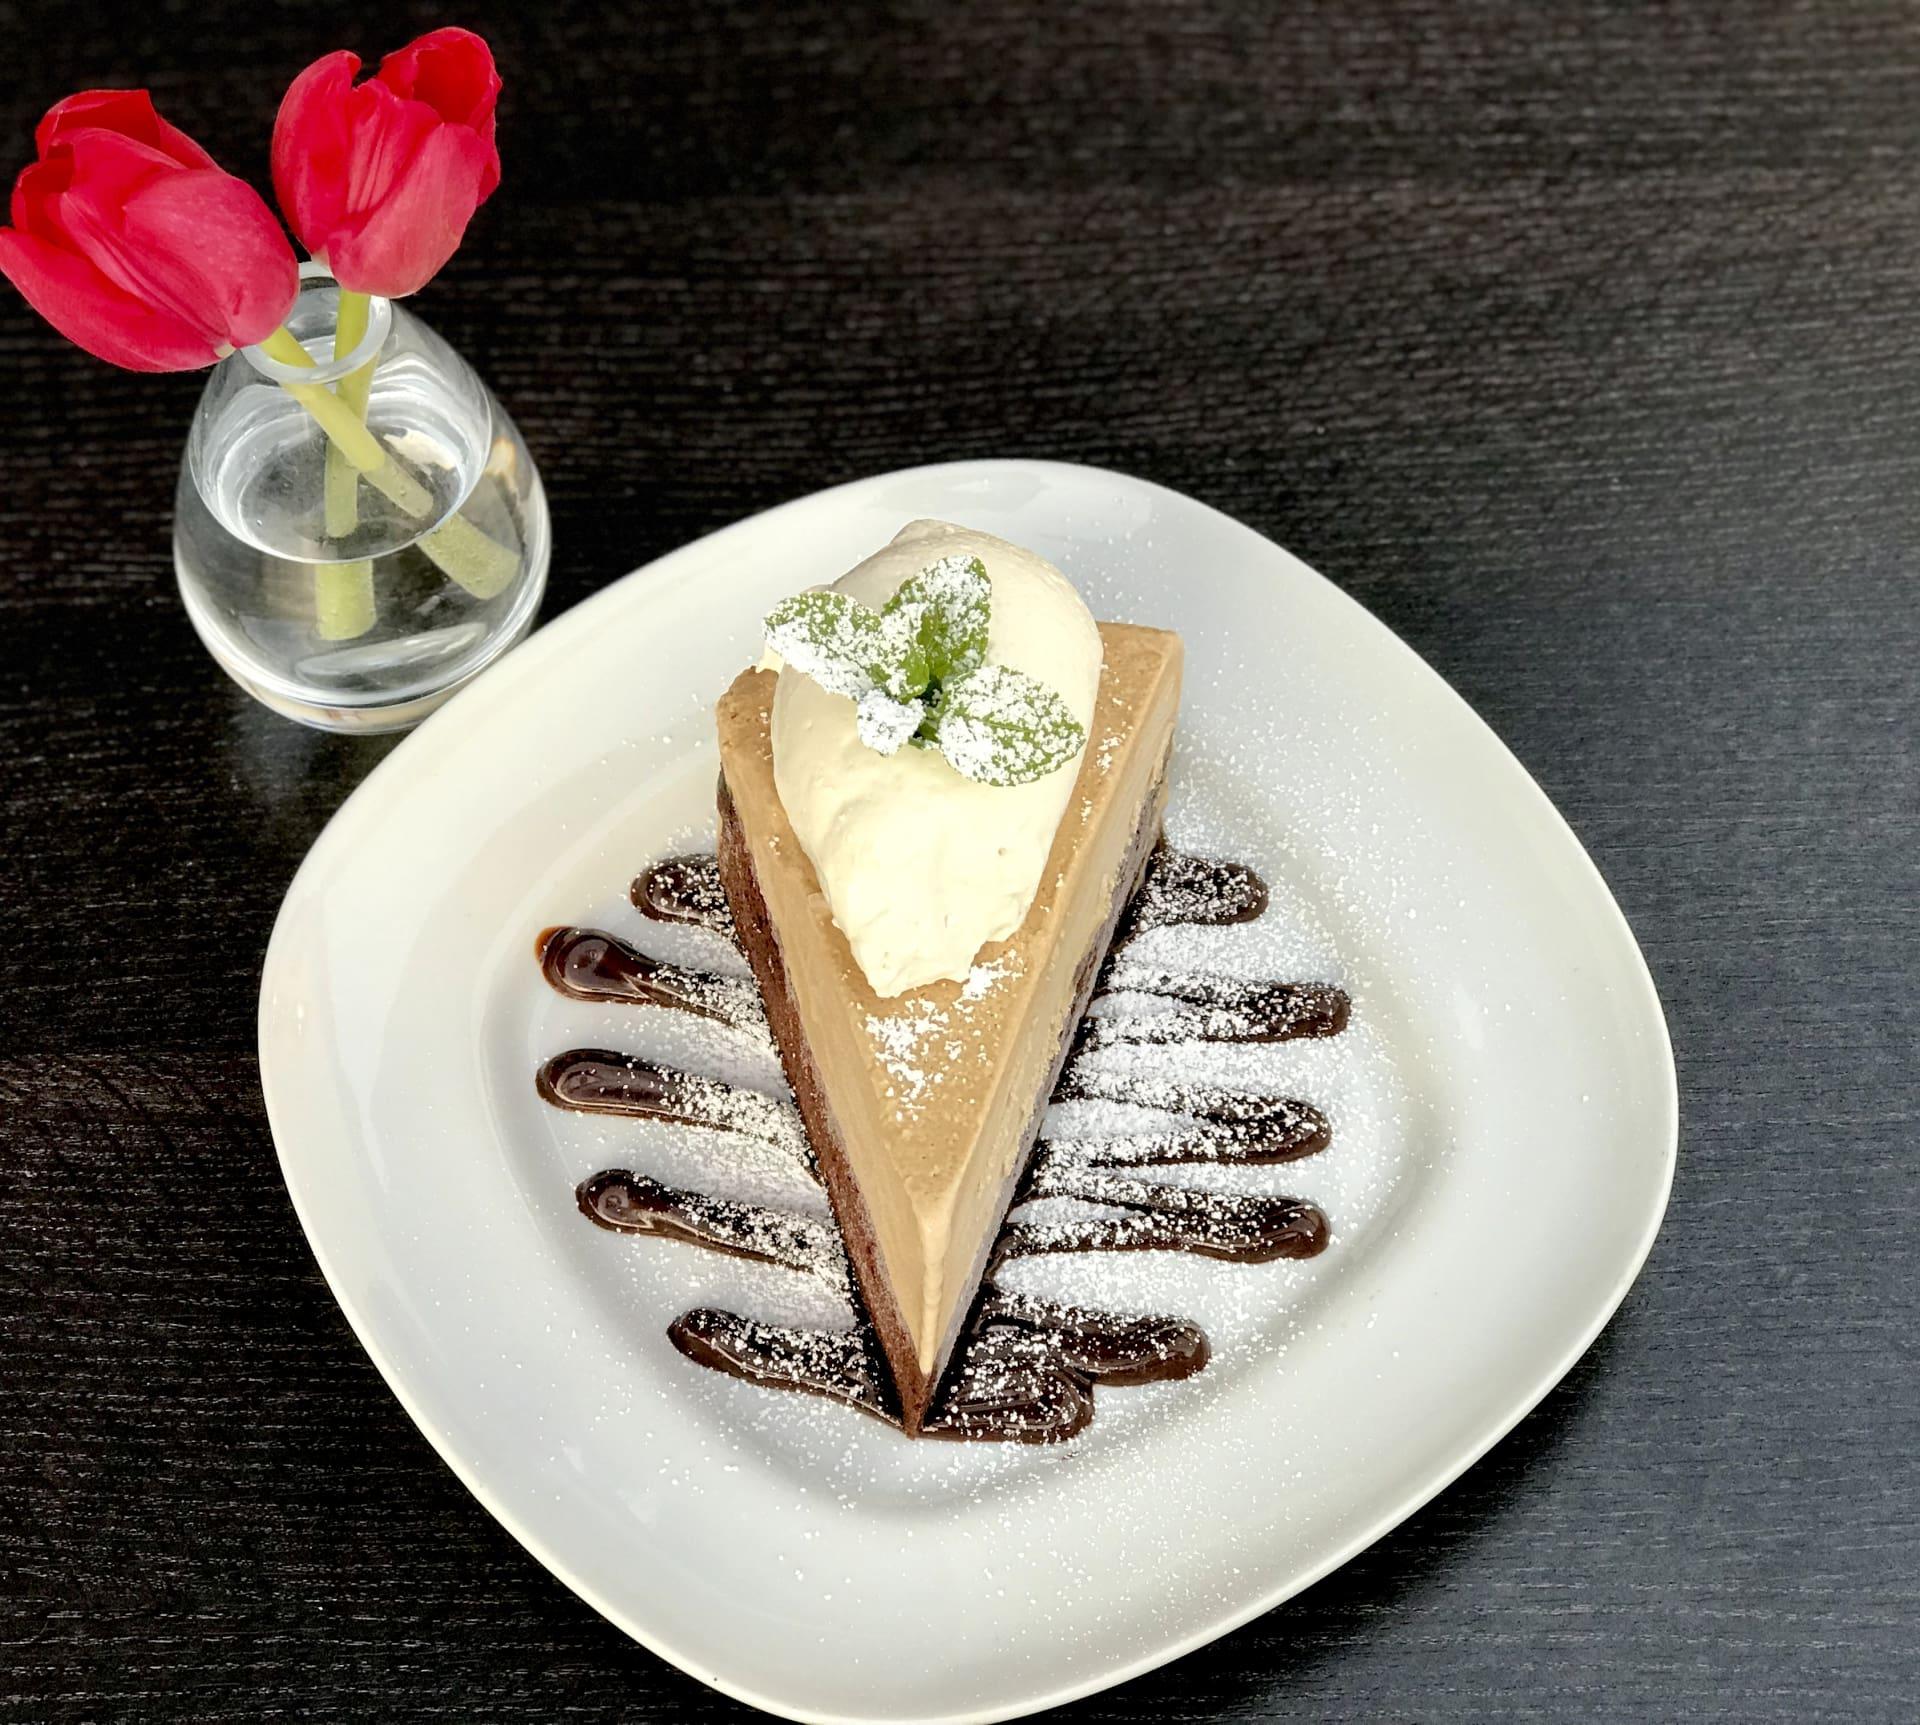 Mississippi Mud Pie w/ Coffee Ice Cream, Oreo Crust, Chocolate Sauce & Whip Cream